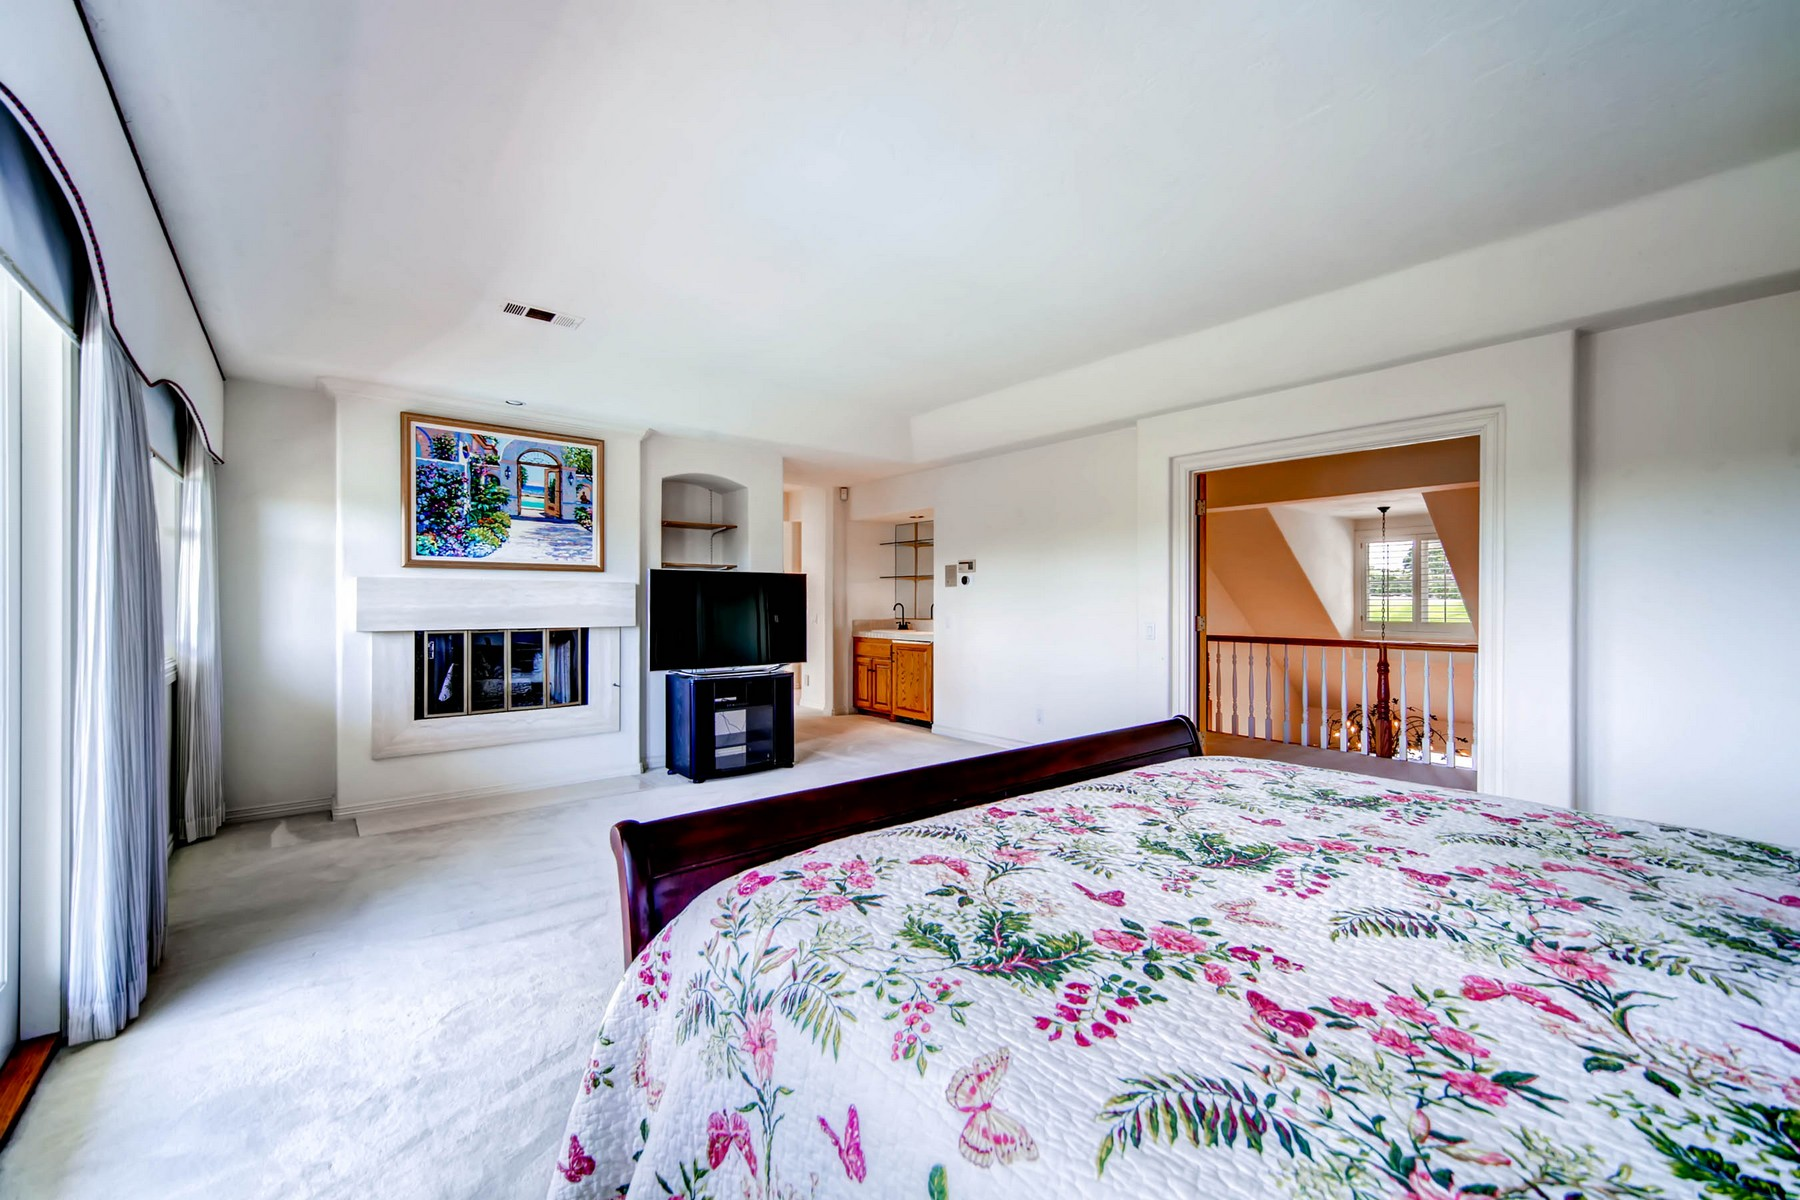 Additional photo for property listing at 5720 Lago Lindo  Rancho Santa Fe, Калифорния 92067 Соединенные Штаты